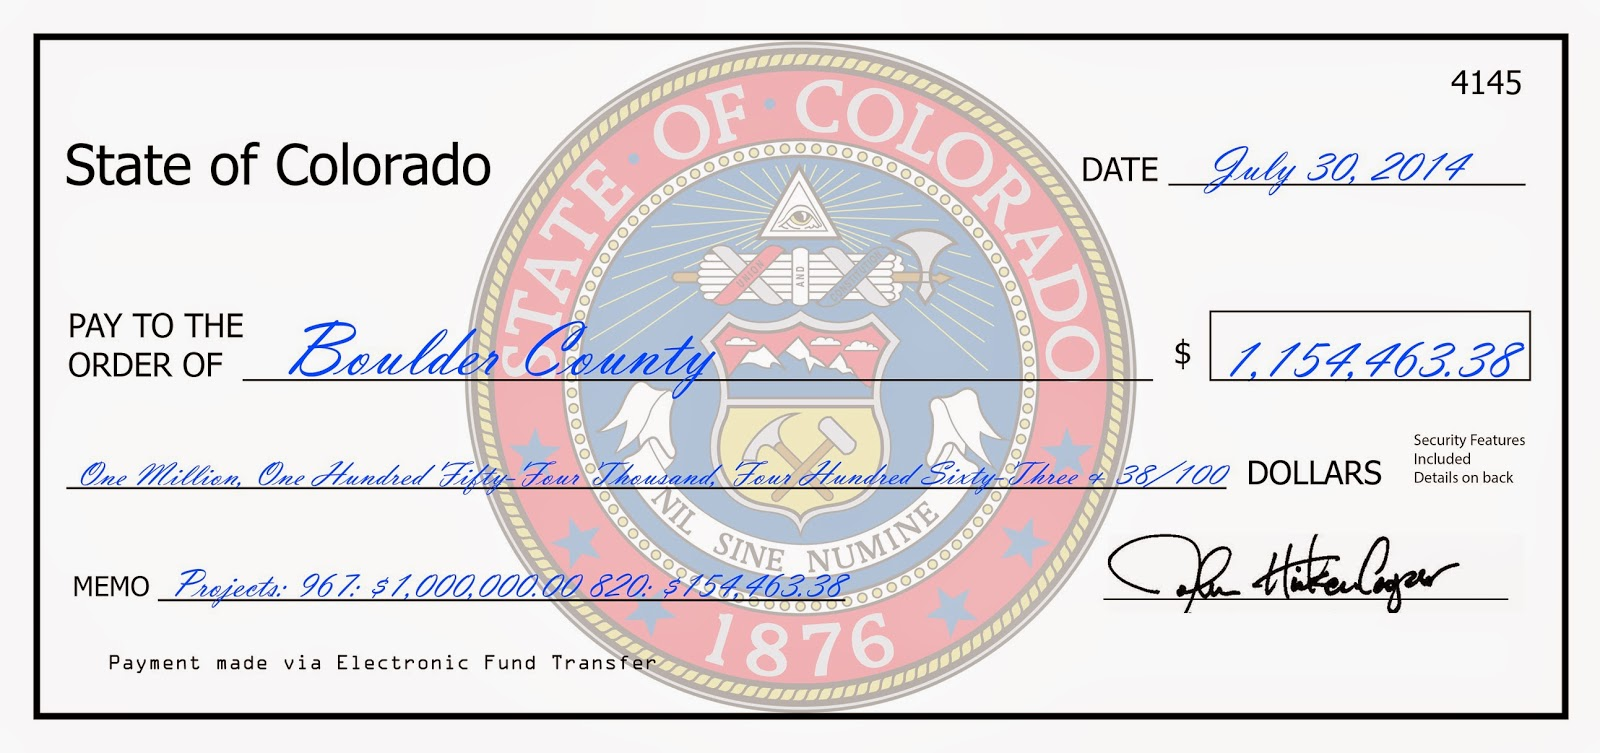 Check delivered to Boulder county for public assistance reimbursements.